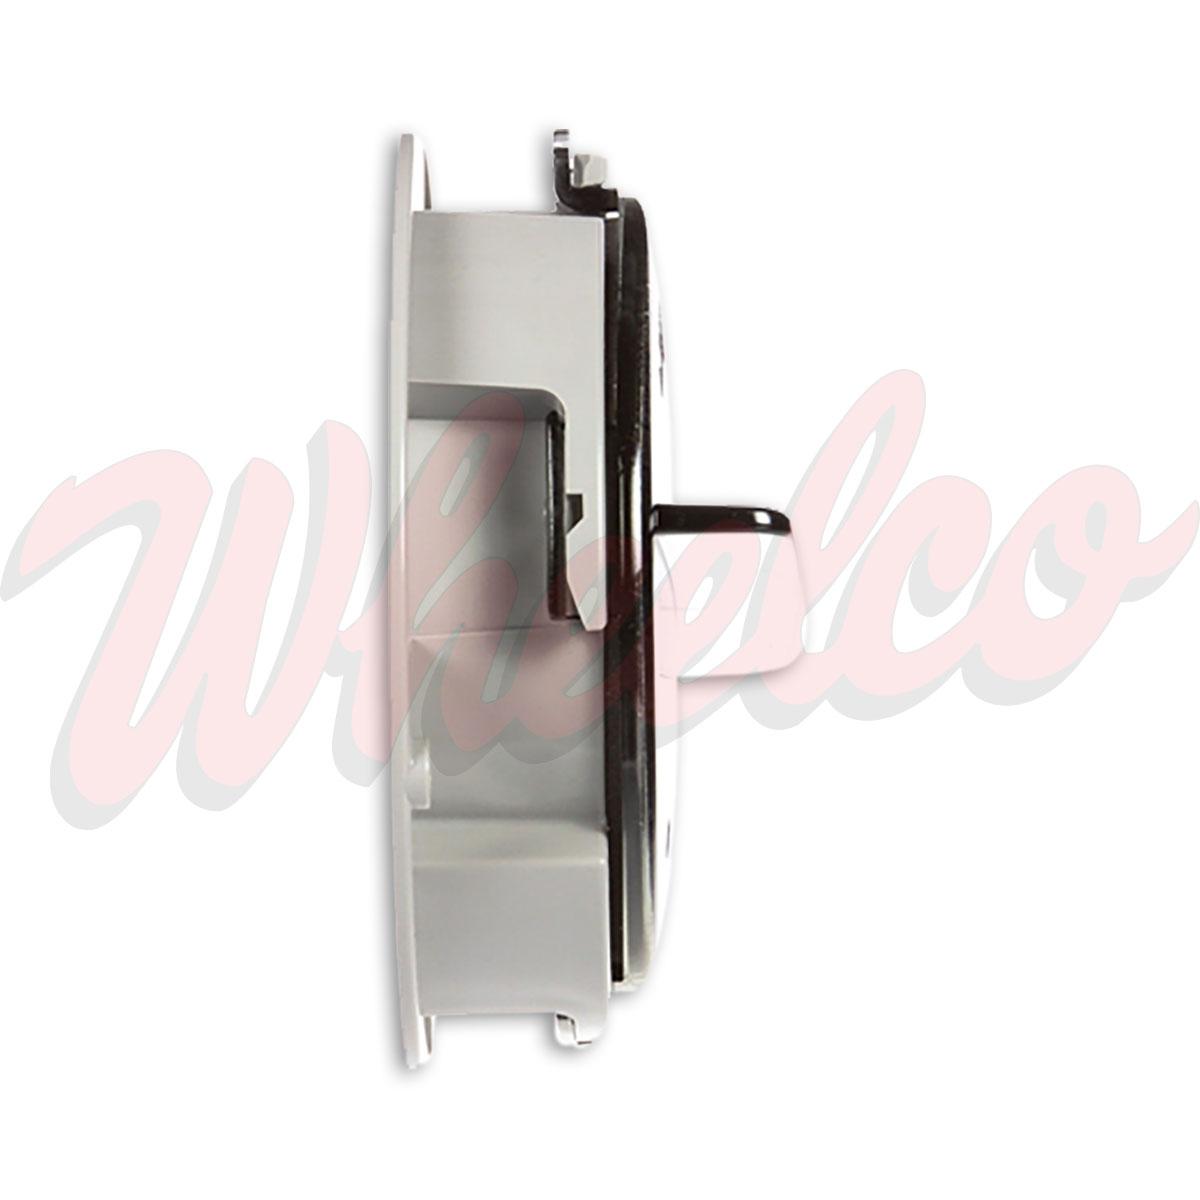 Details about  /Truck-Lite 97960 Document Holder 1J-1737-Z14